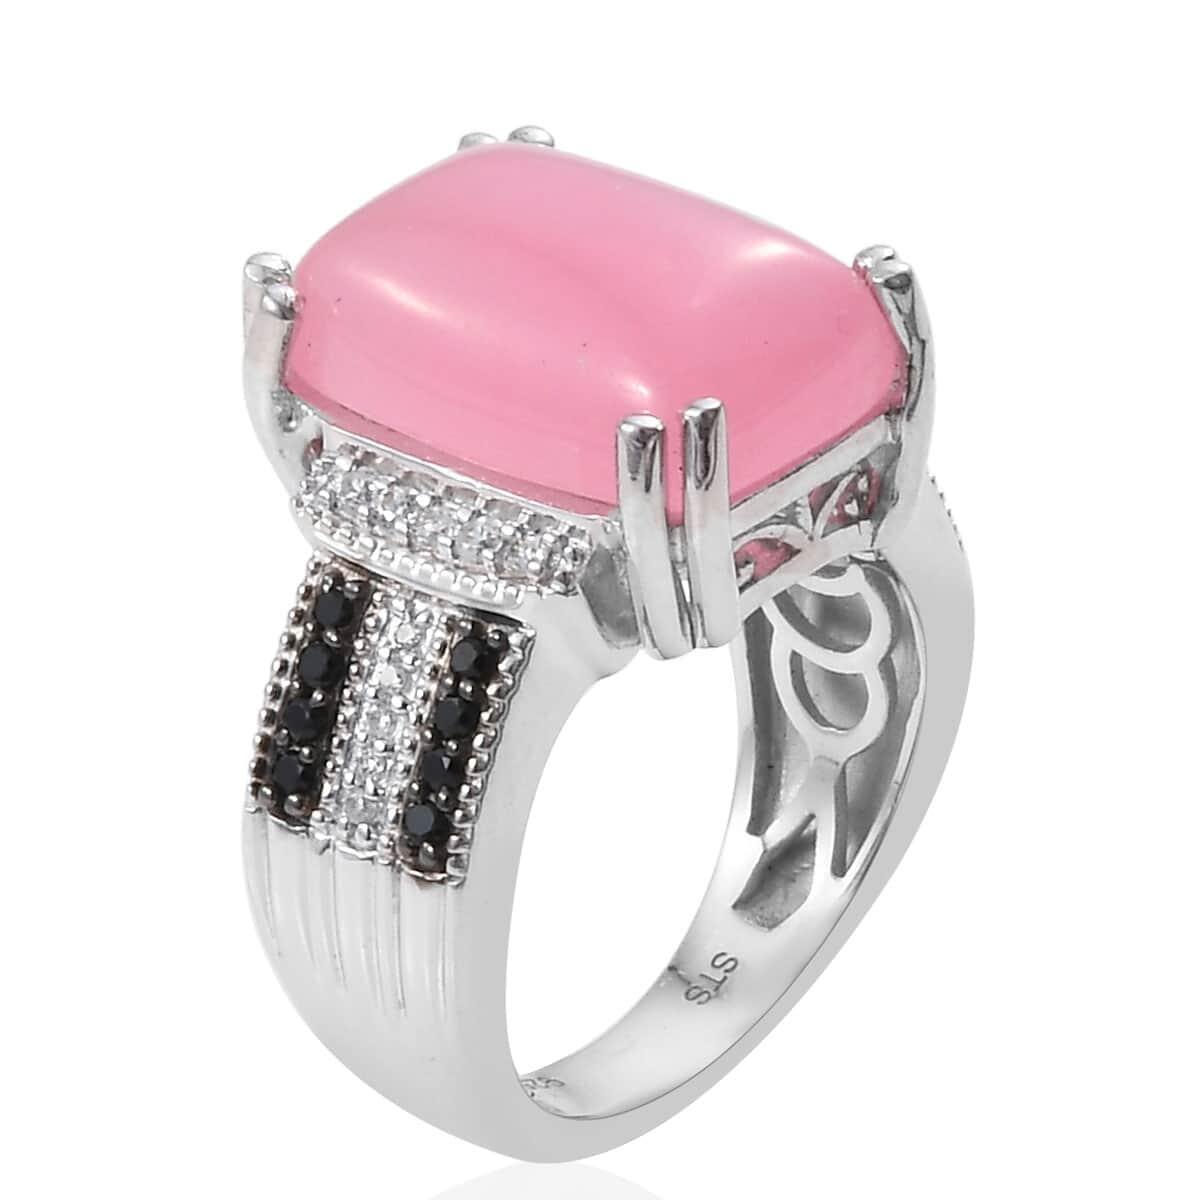 Burmese Pink Jade, Multi Gemstone Ring in Platinum Over Sterling Silver (Size 5.0) 8.61 ctw